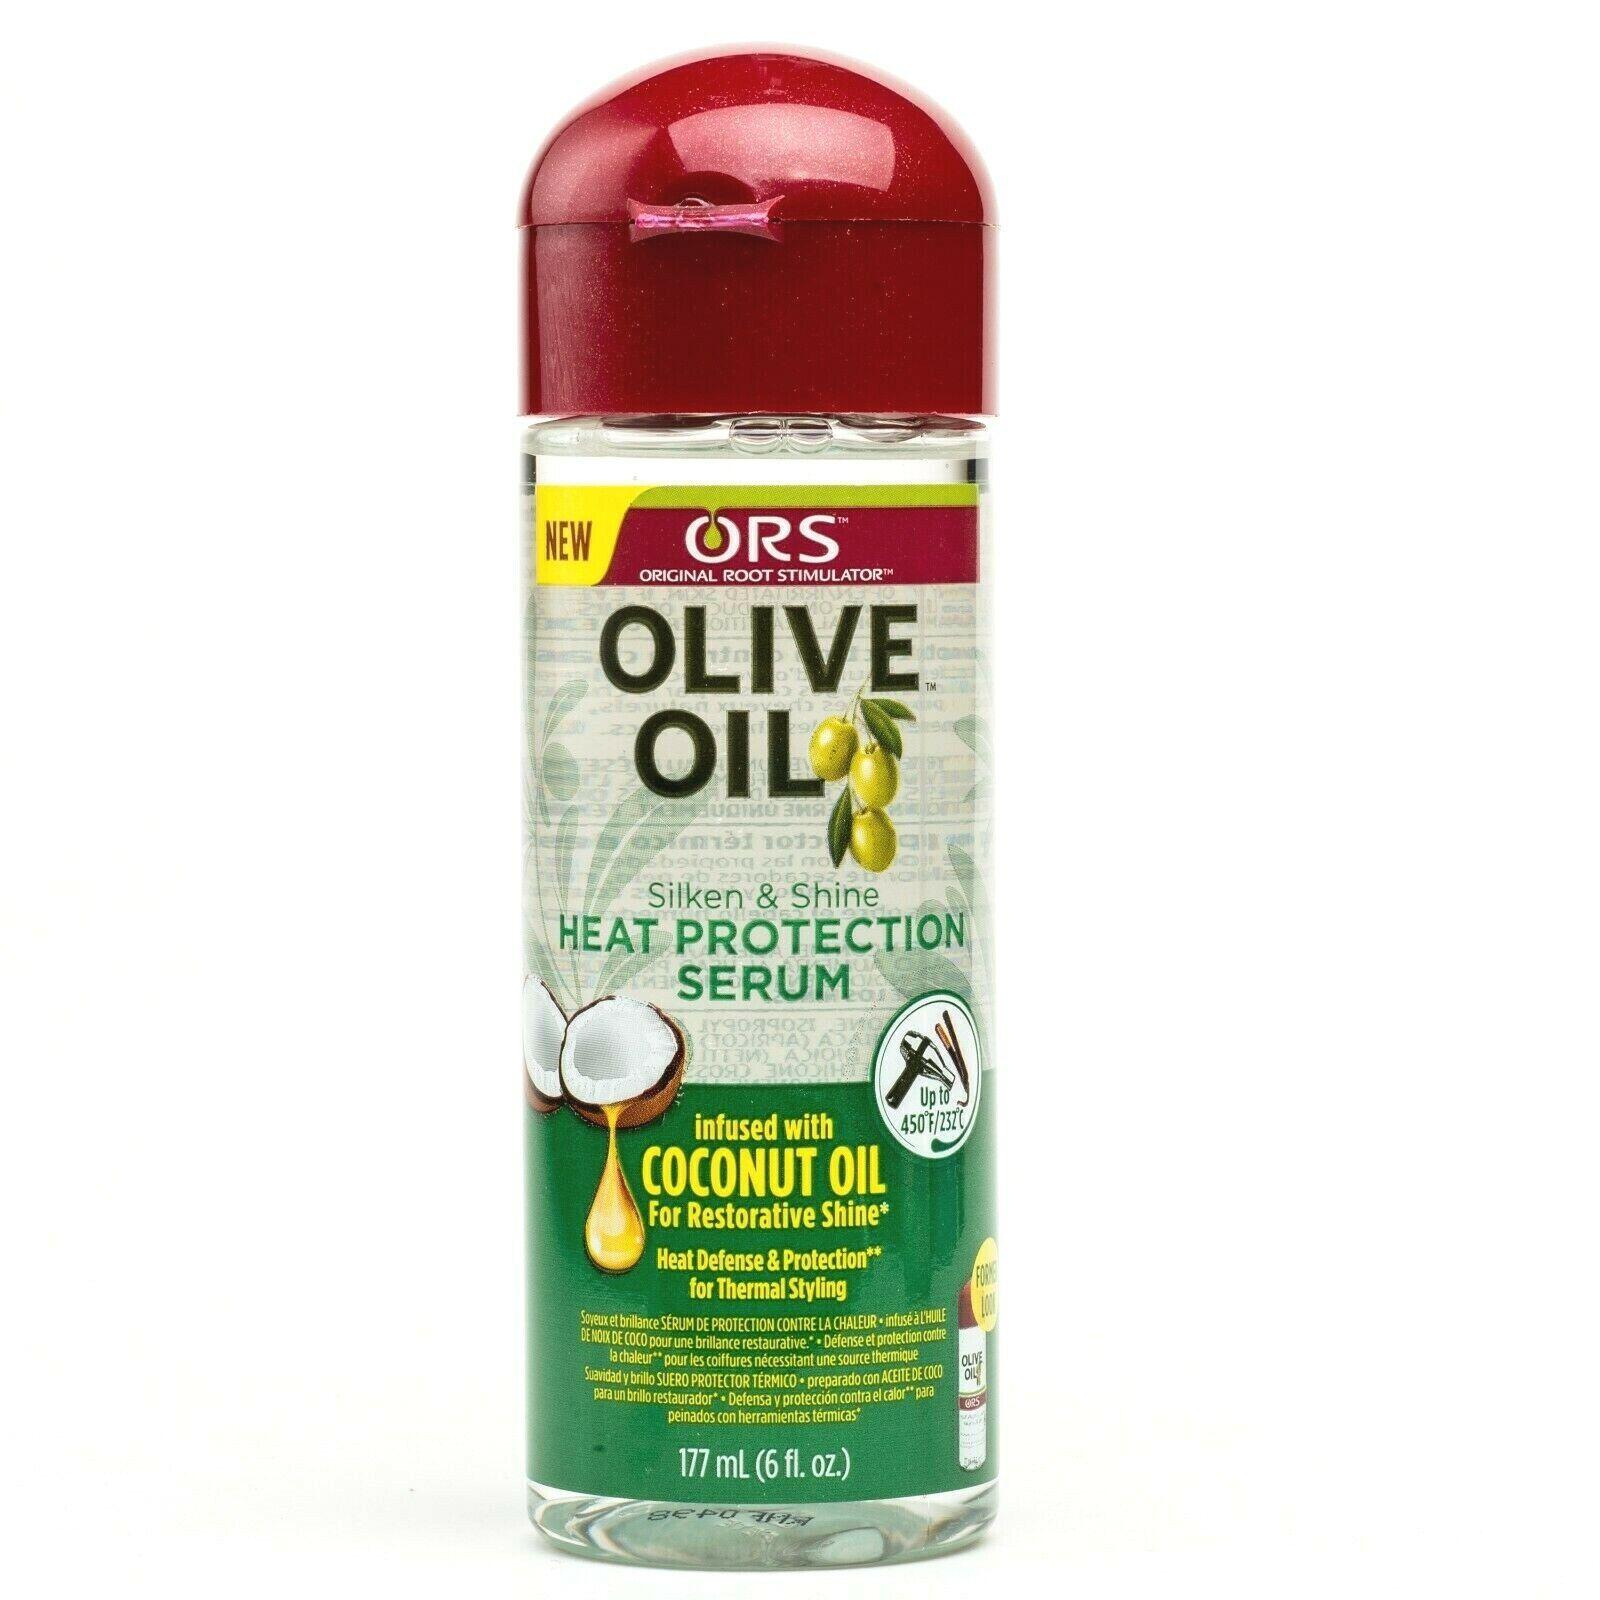 Ors Olive Oil Anti-Frizz Glossing Polisher 6oz Bonus